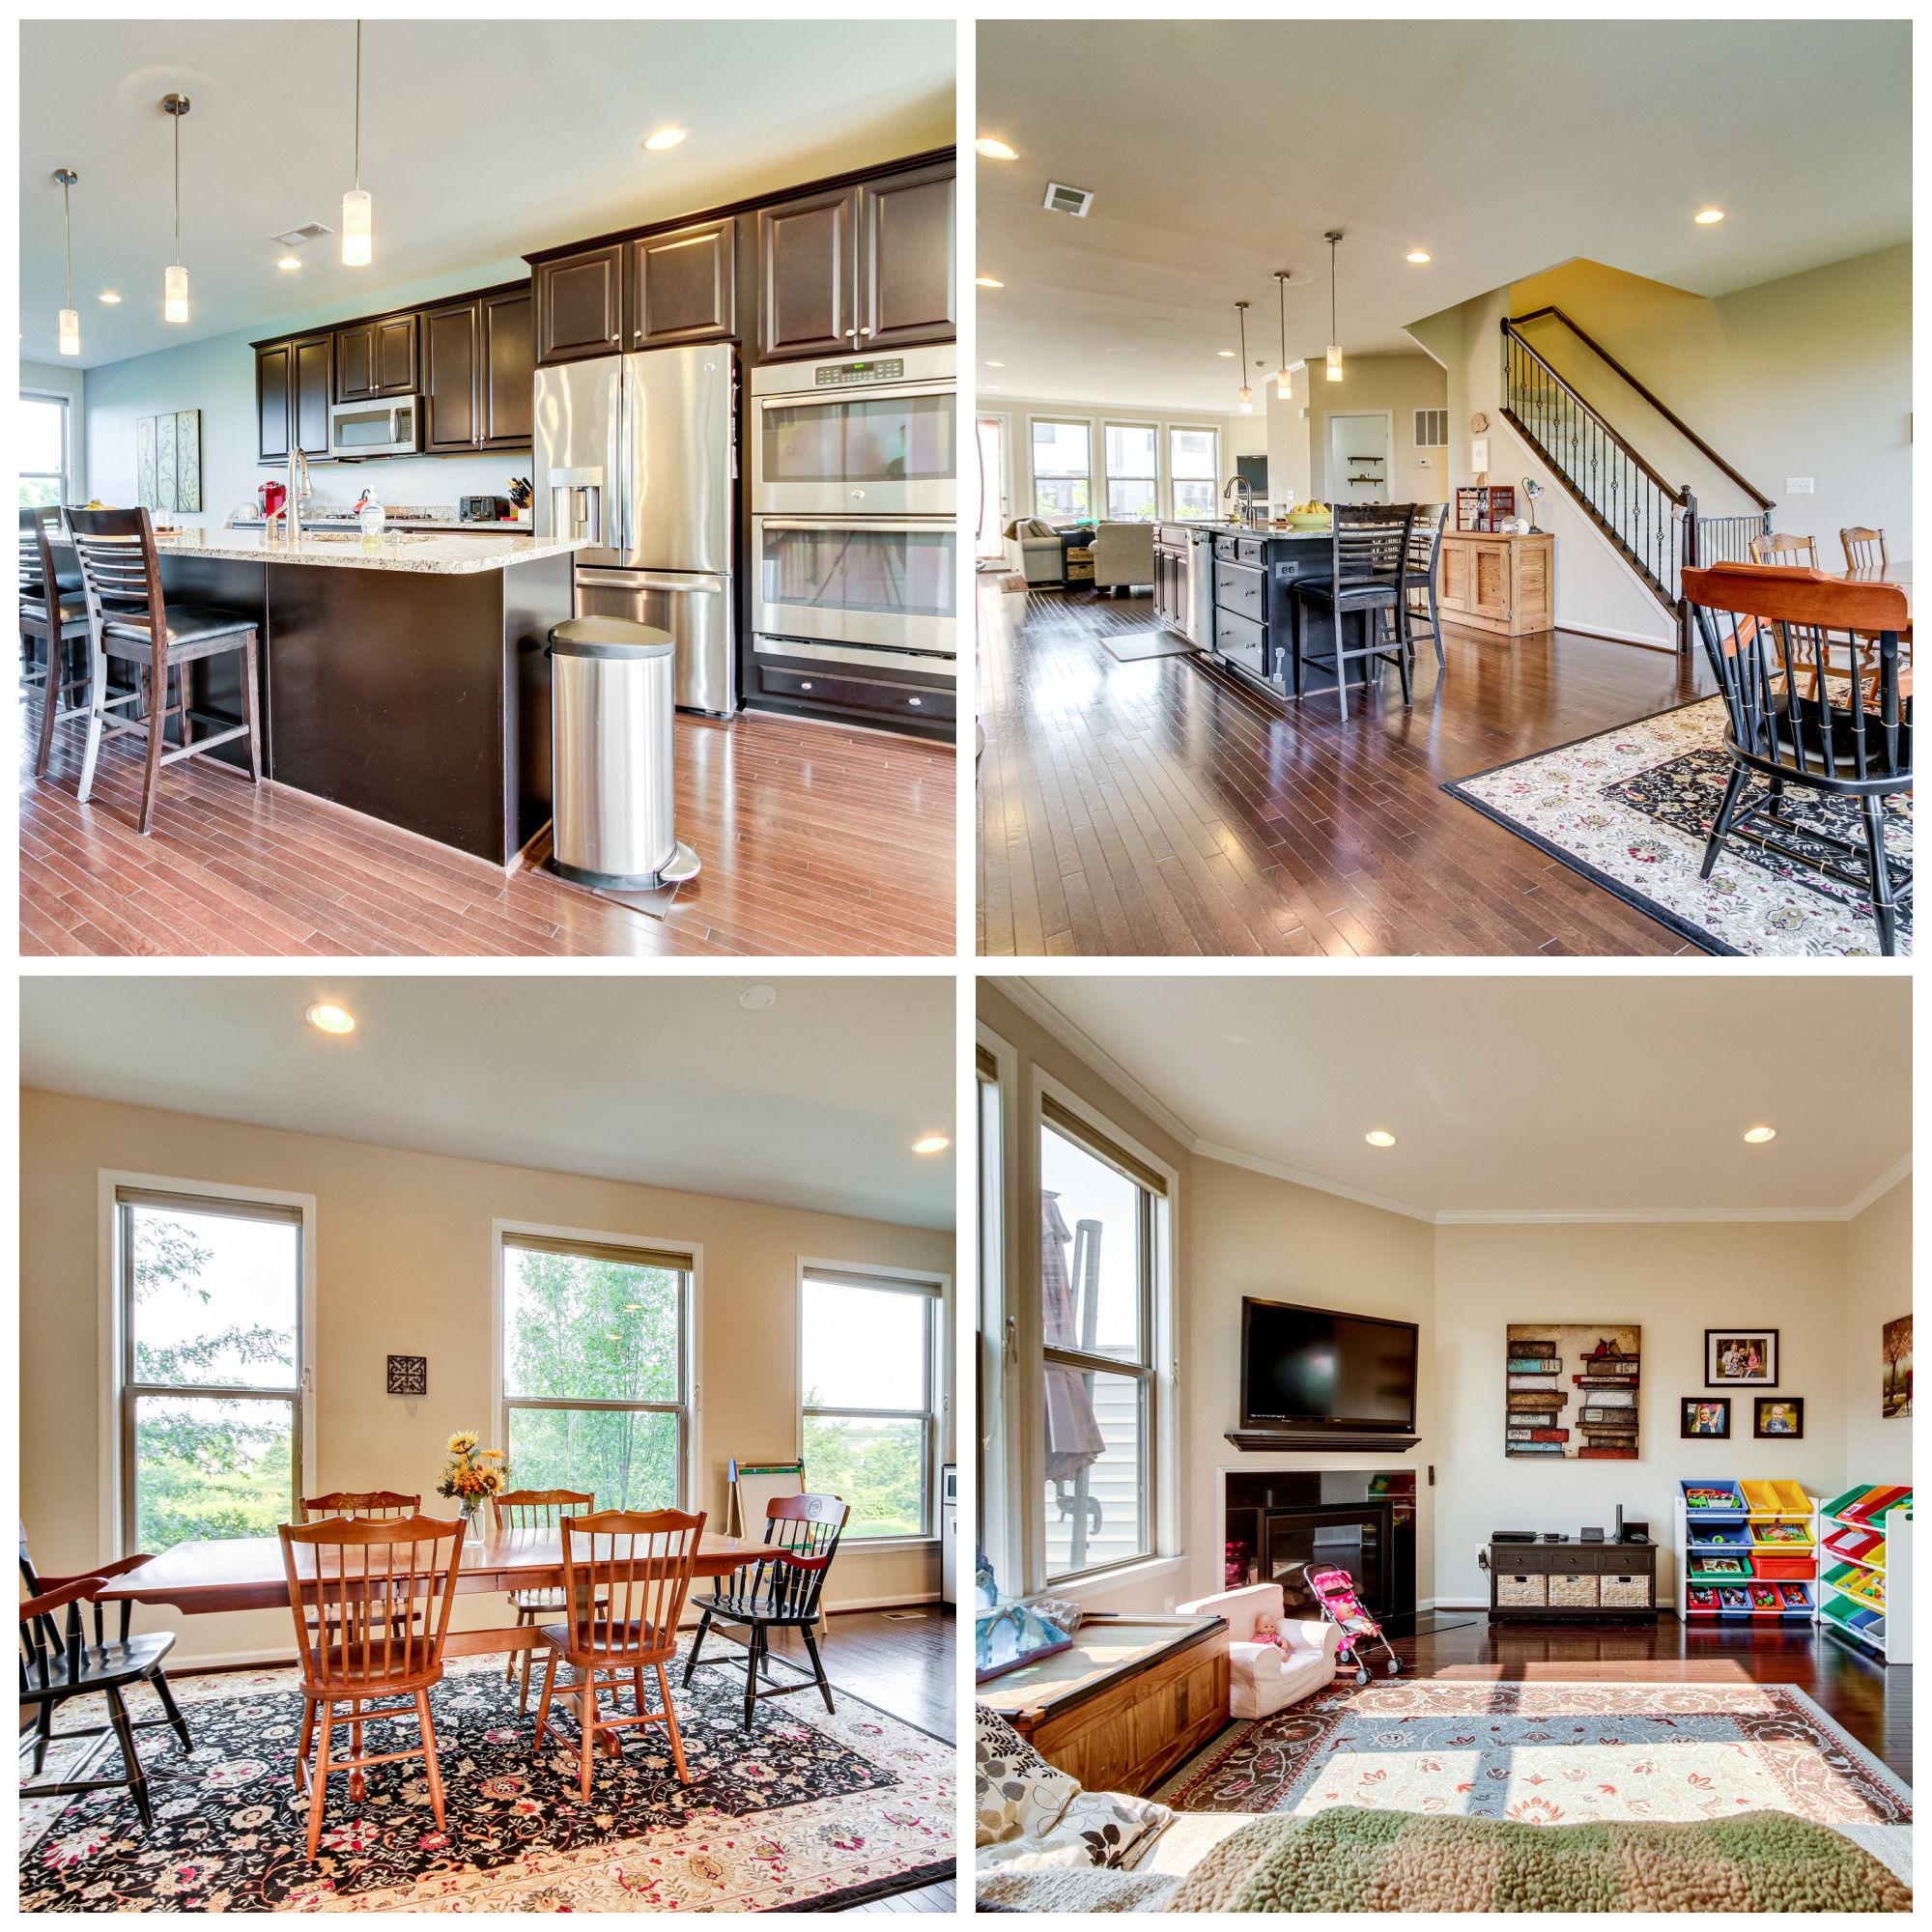 23504 Ashwood Moss Ter, Brambleton- Kitchen, Dining, and Family Room